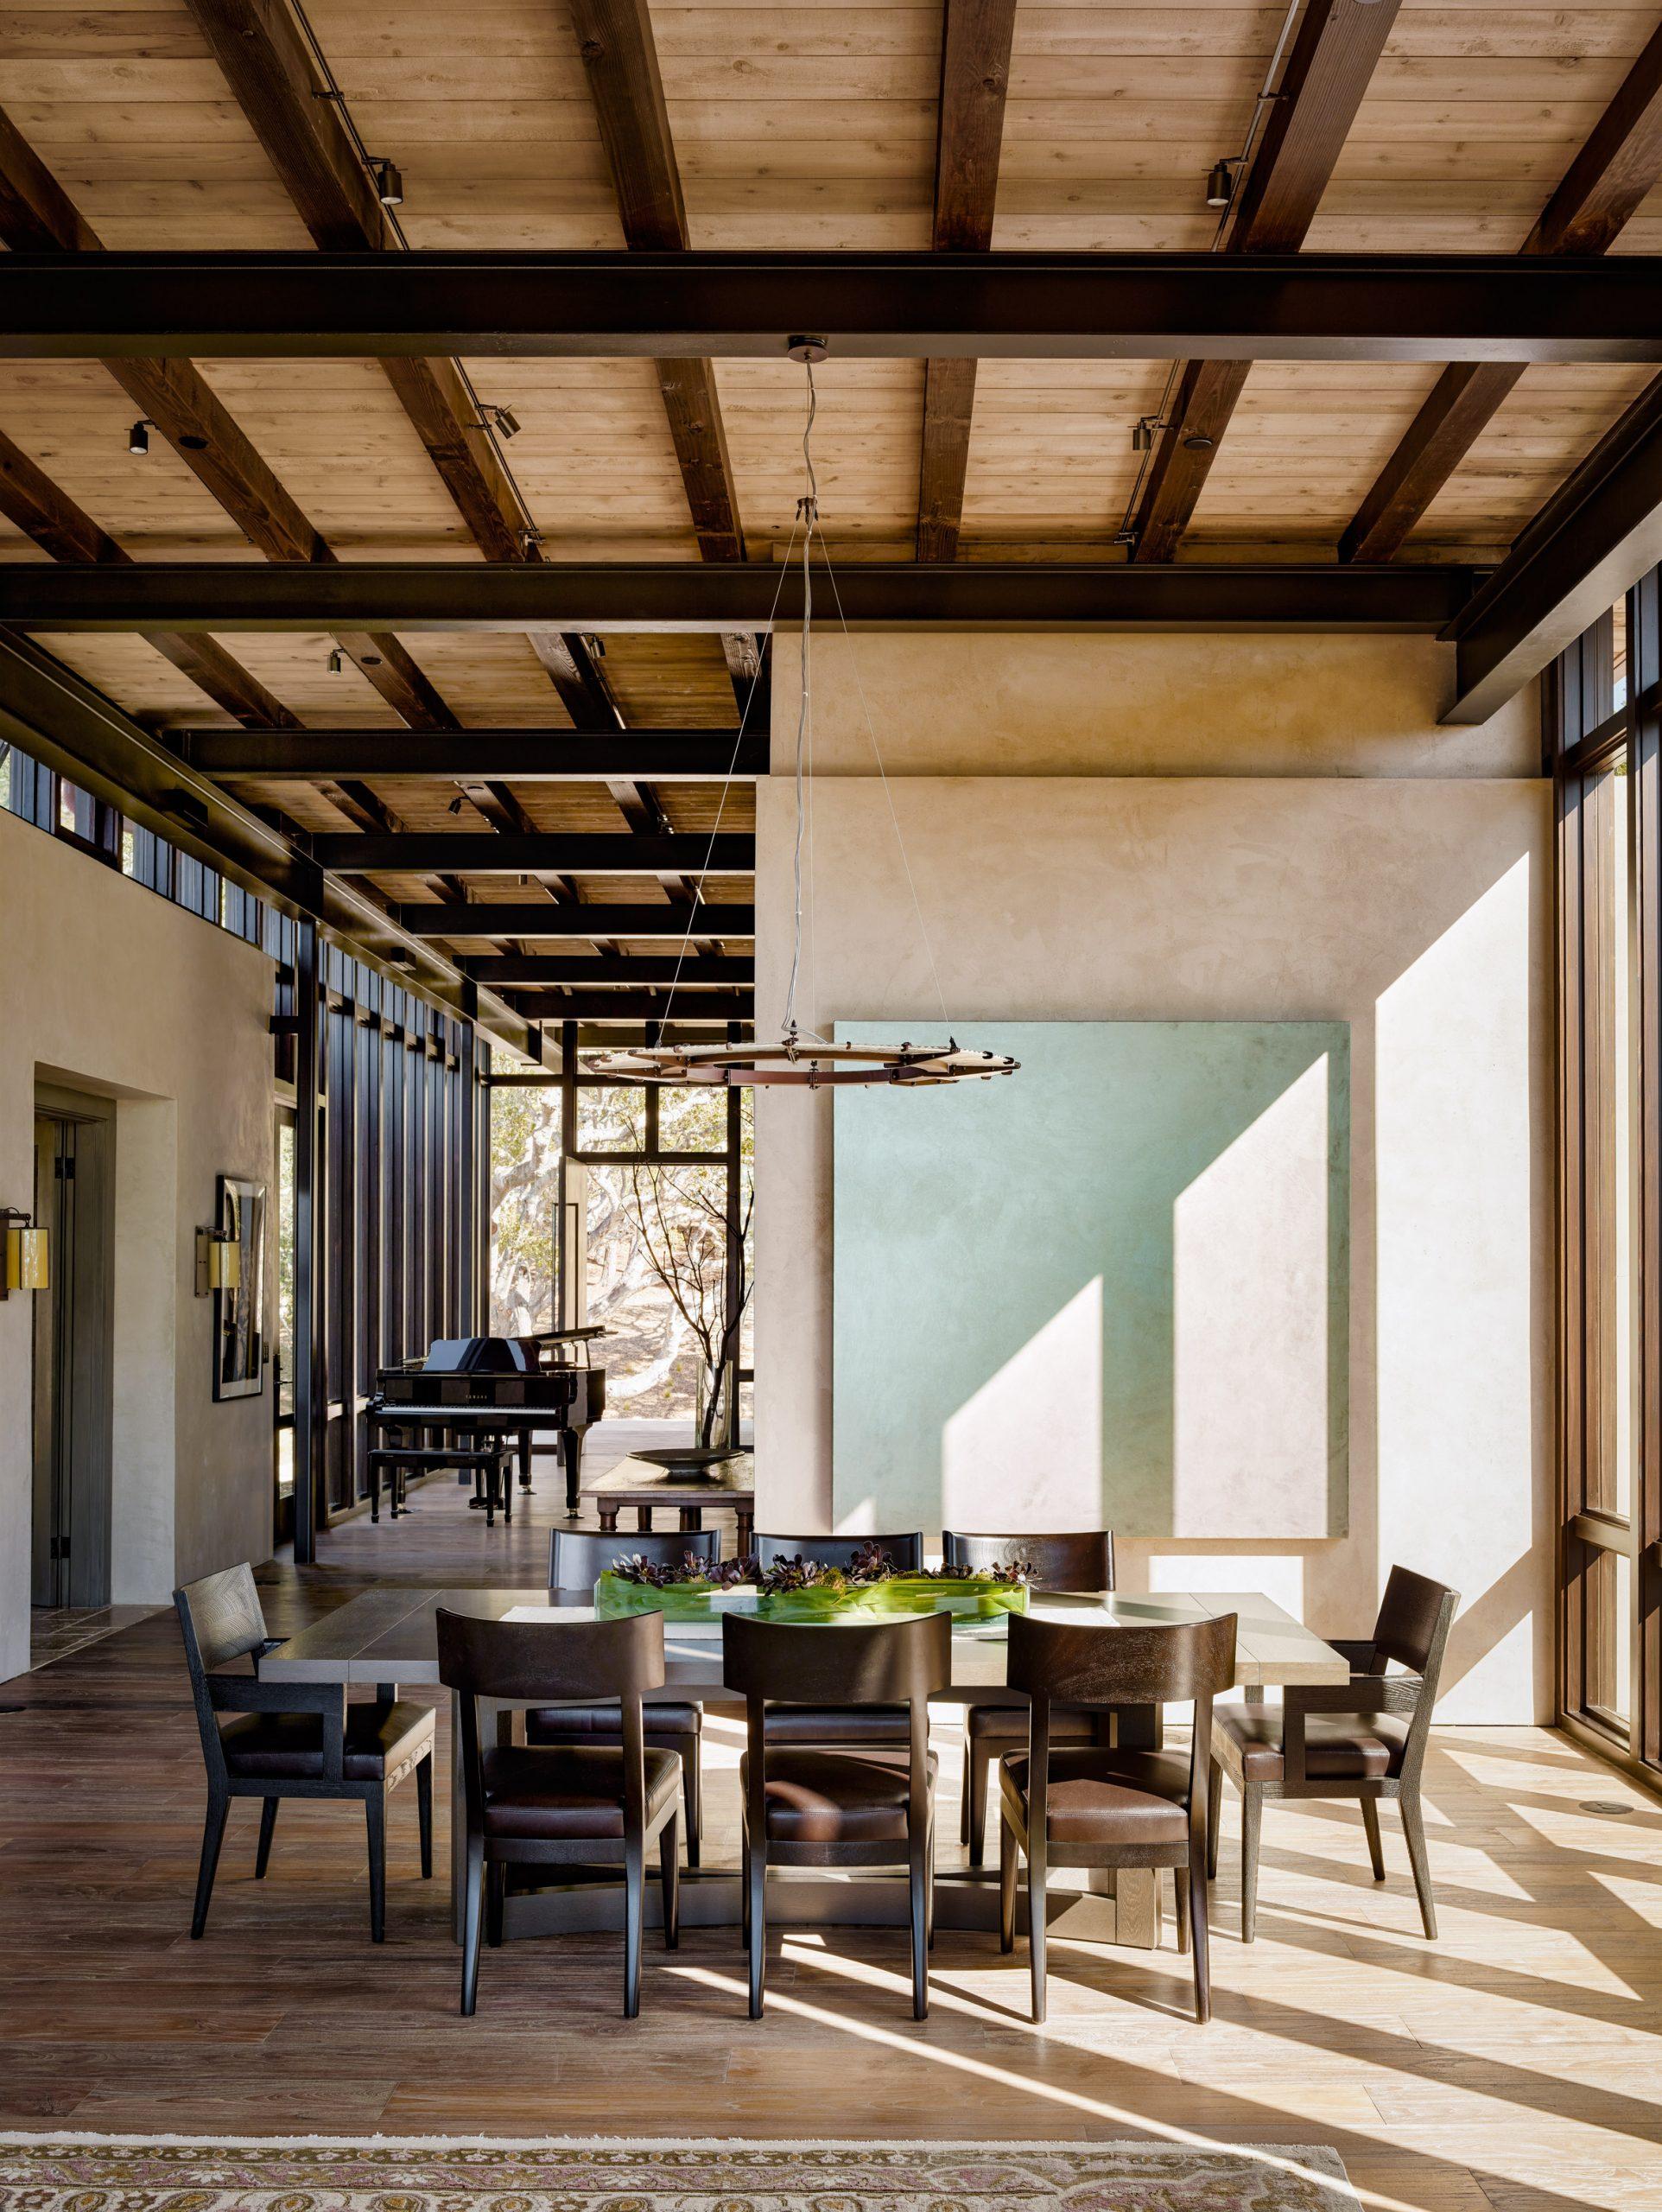 Thiết kế nhà kiểu Resort 5